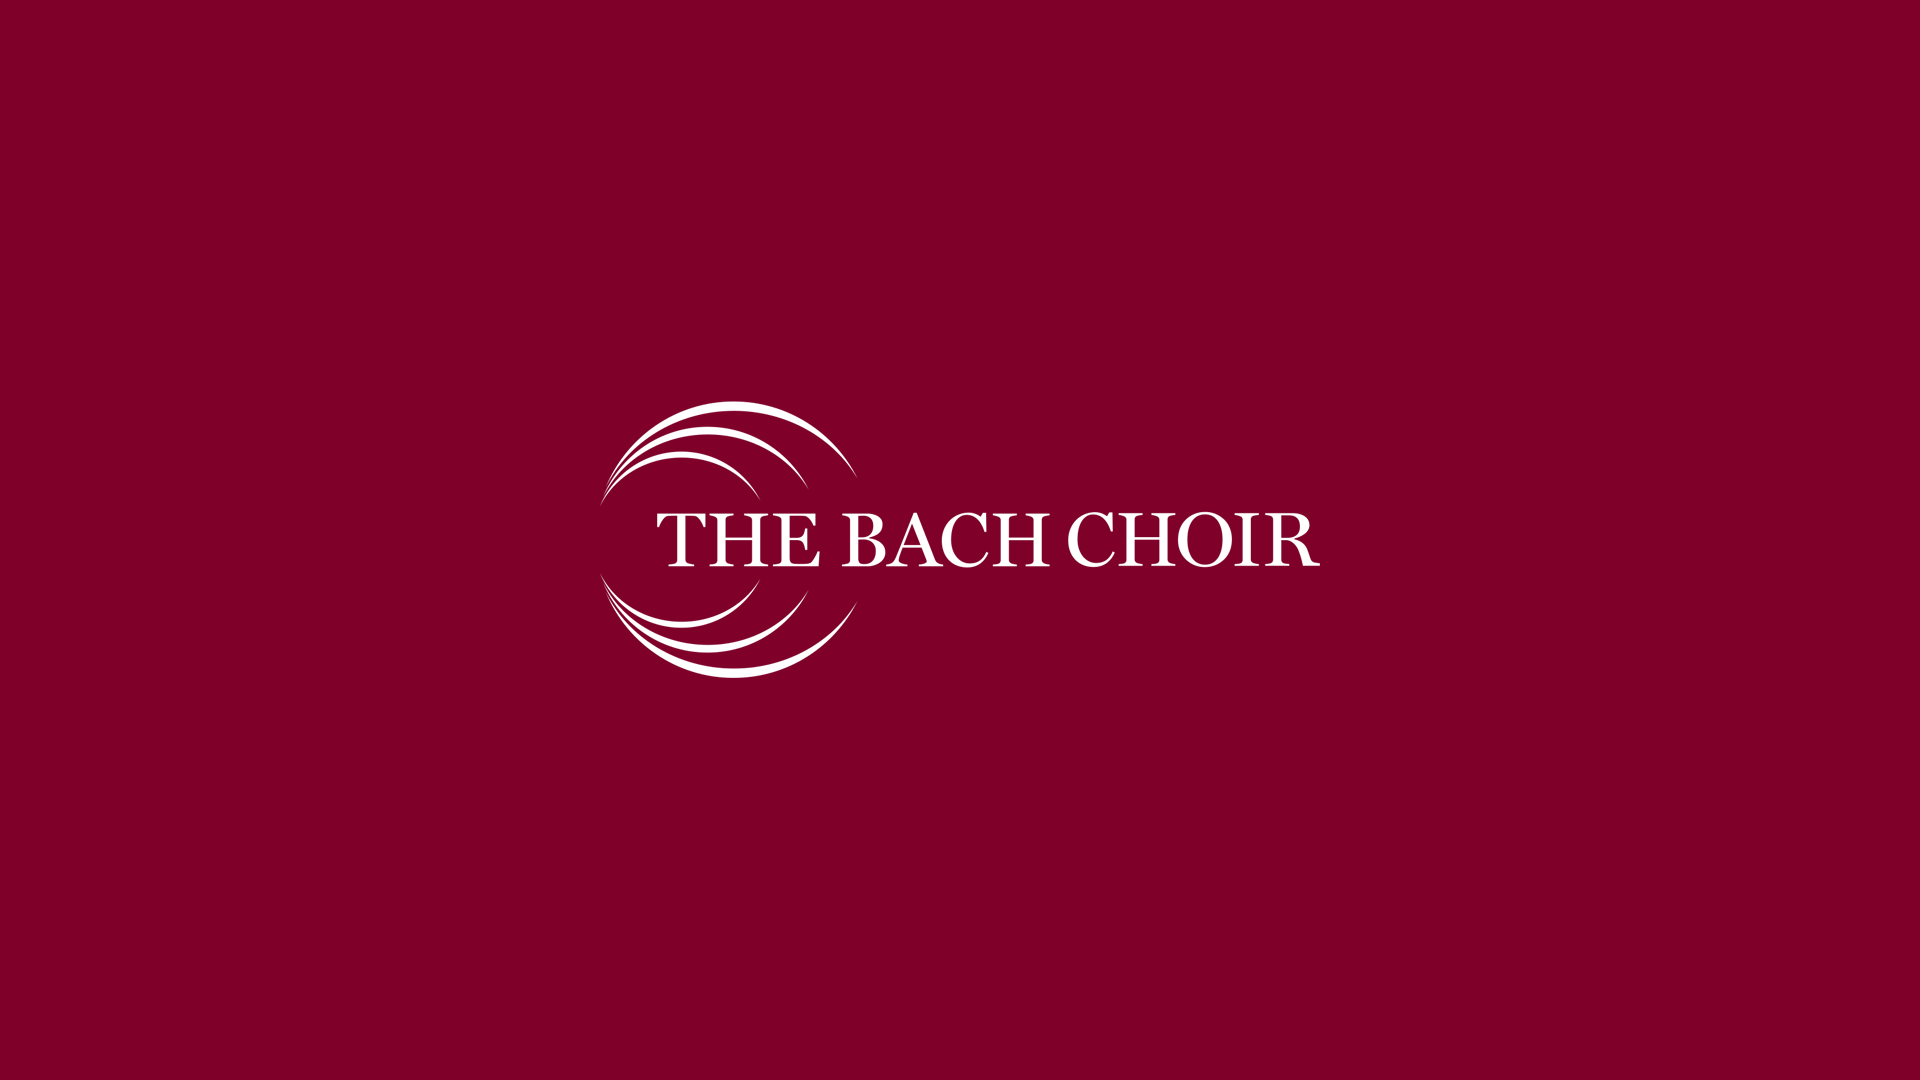 The-Bach-Choir-Logo-1920px